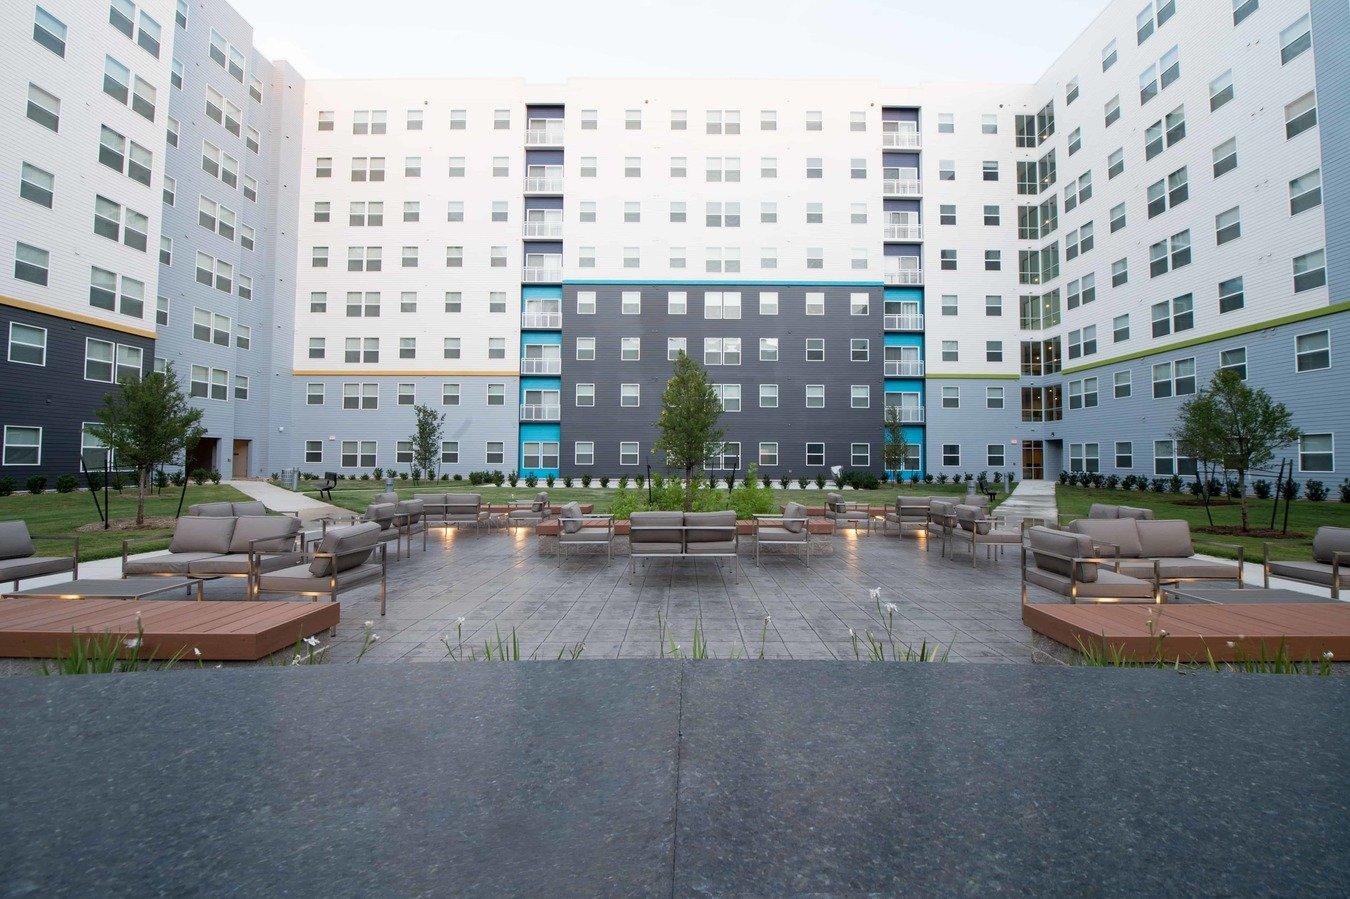 Park West Apartments College Station, TX